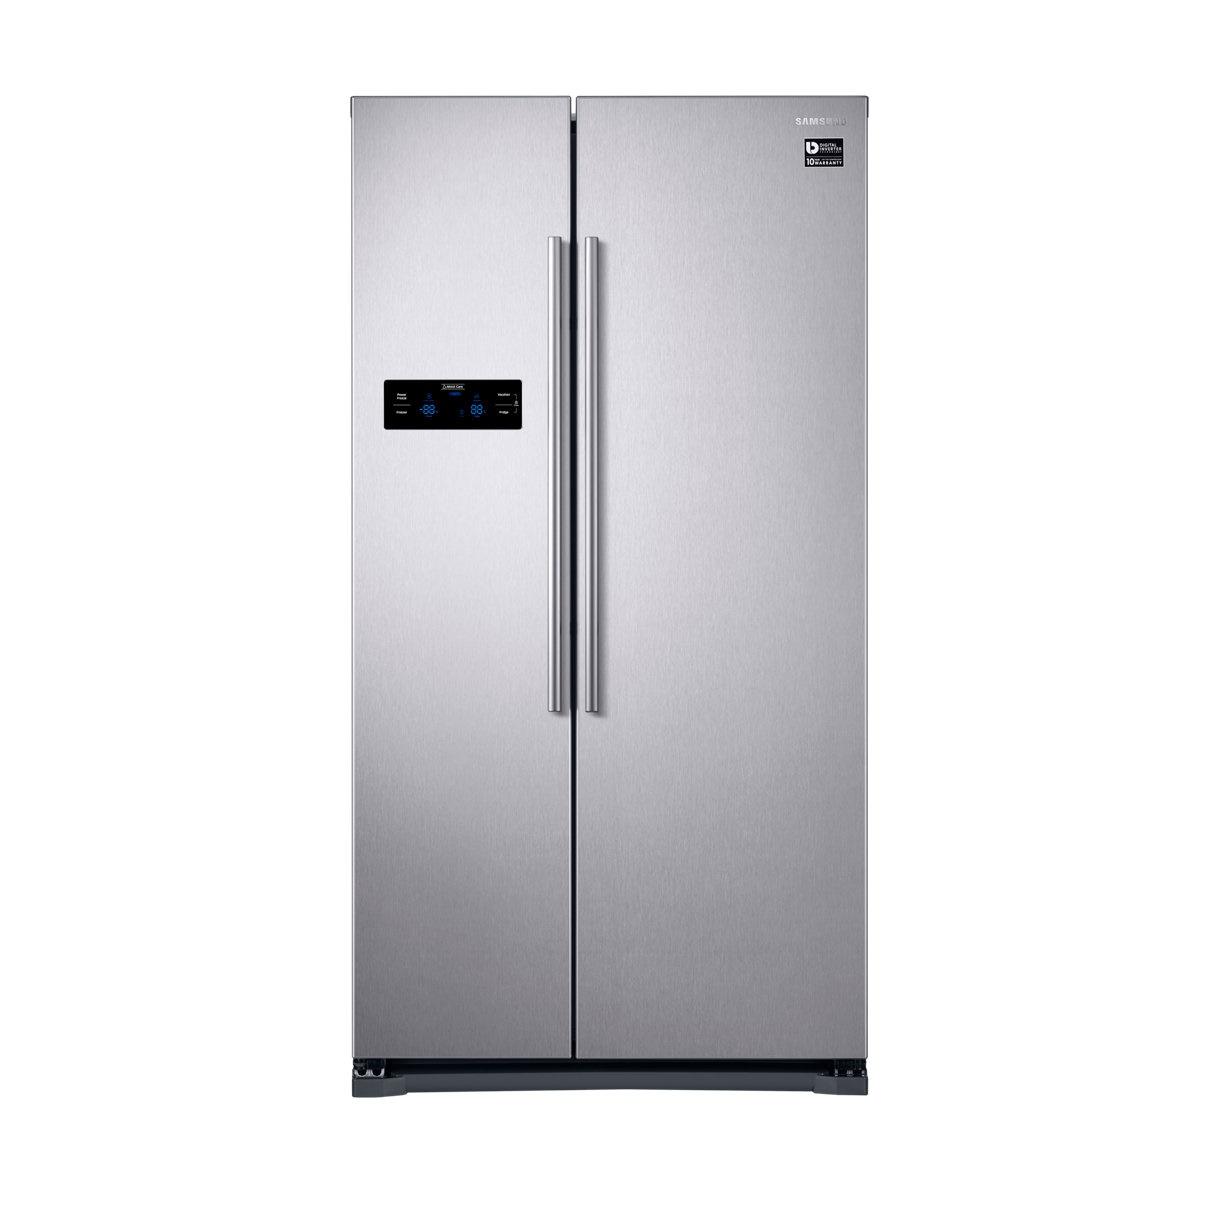 Samsung frižider kombinovani RS57K4000SA/EF - Inelektronik